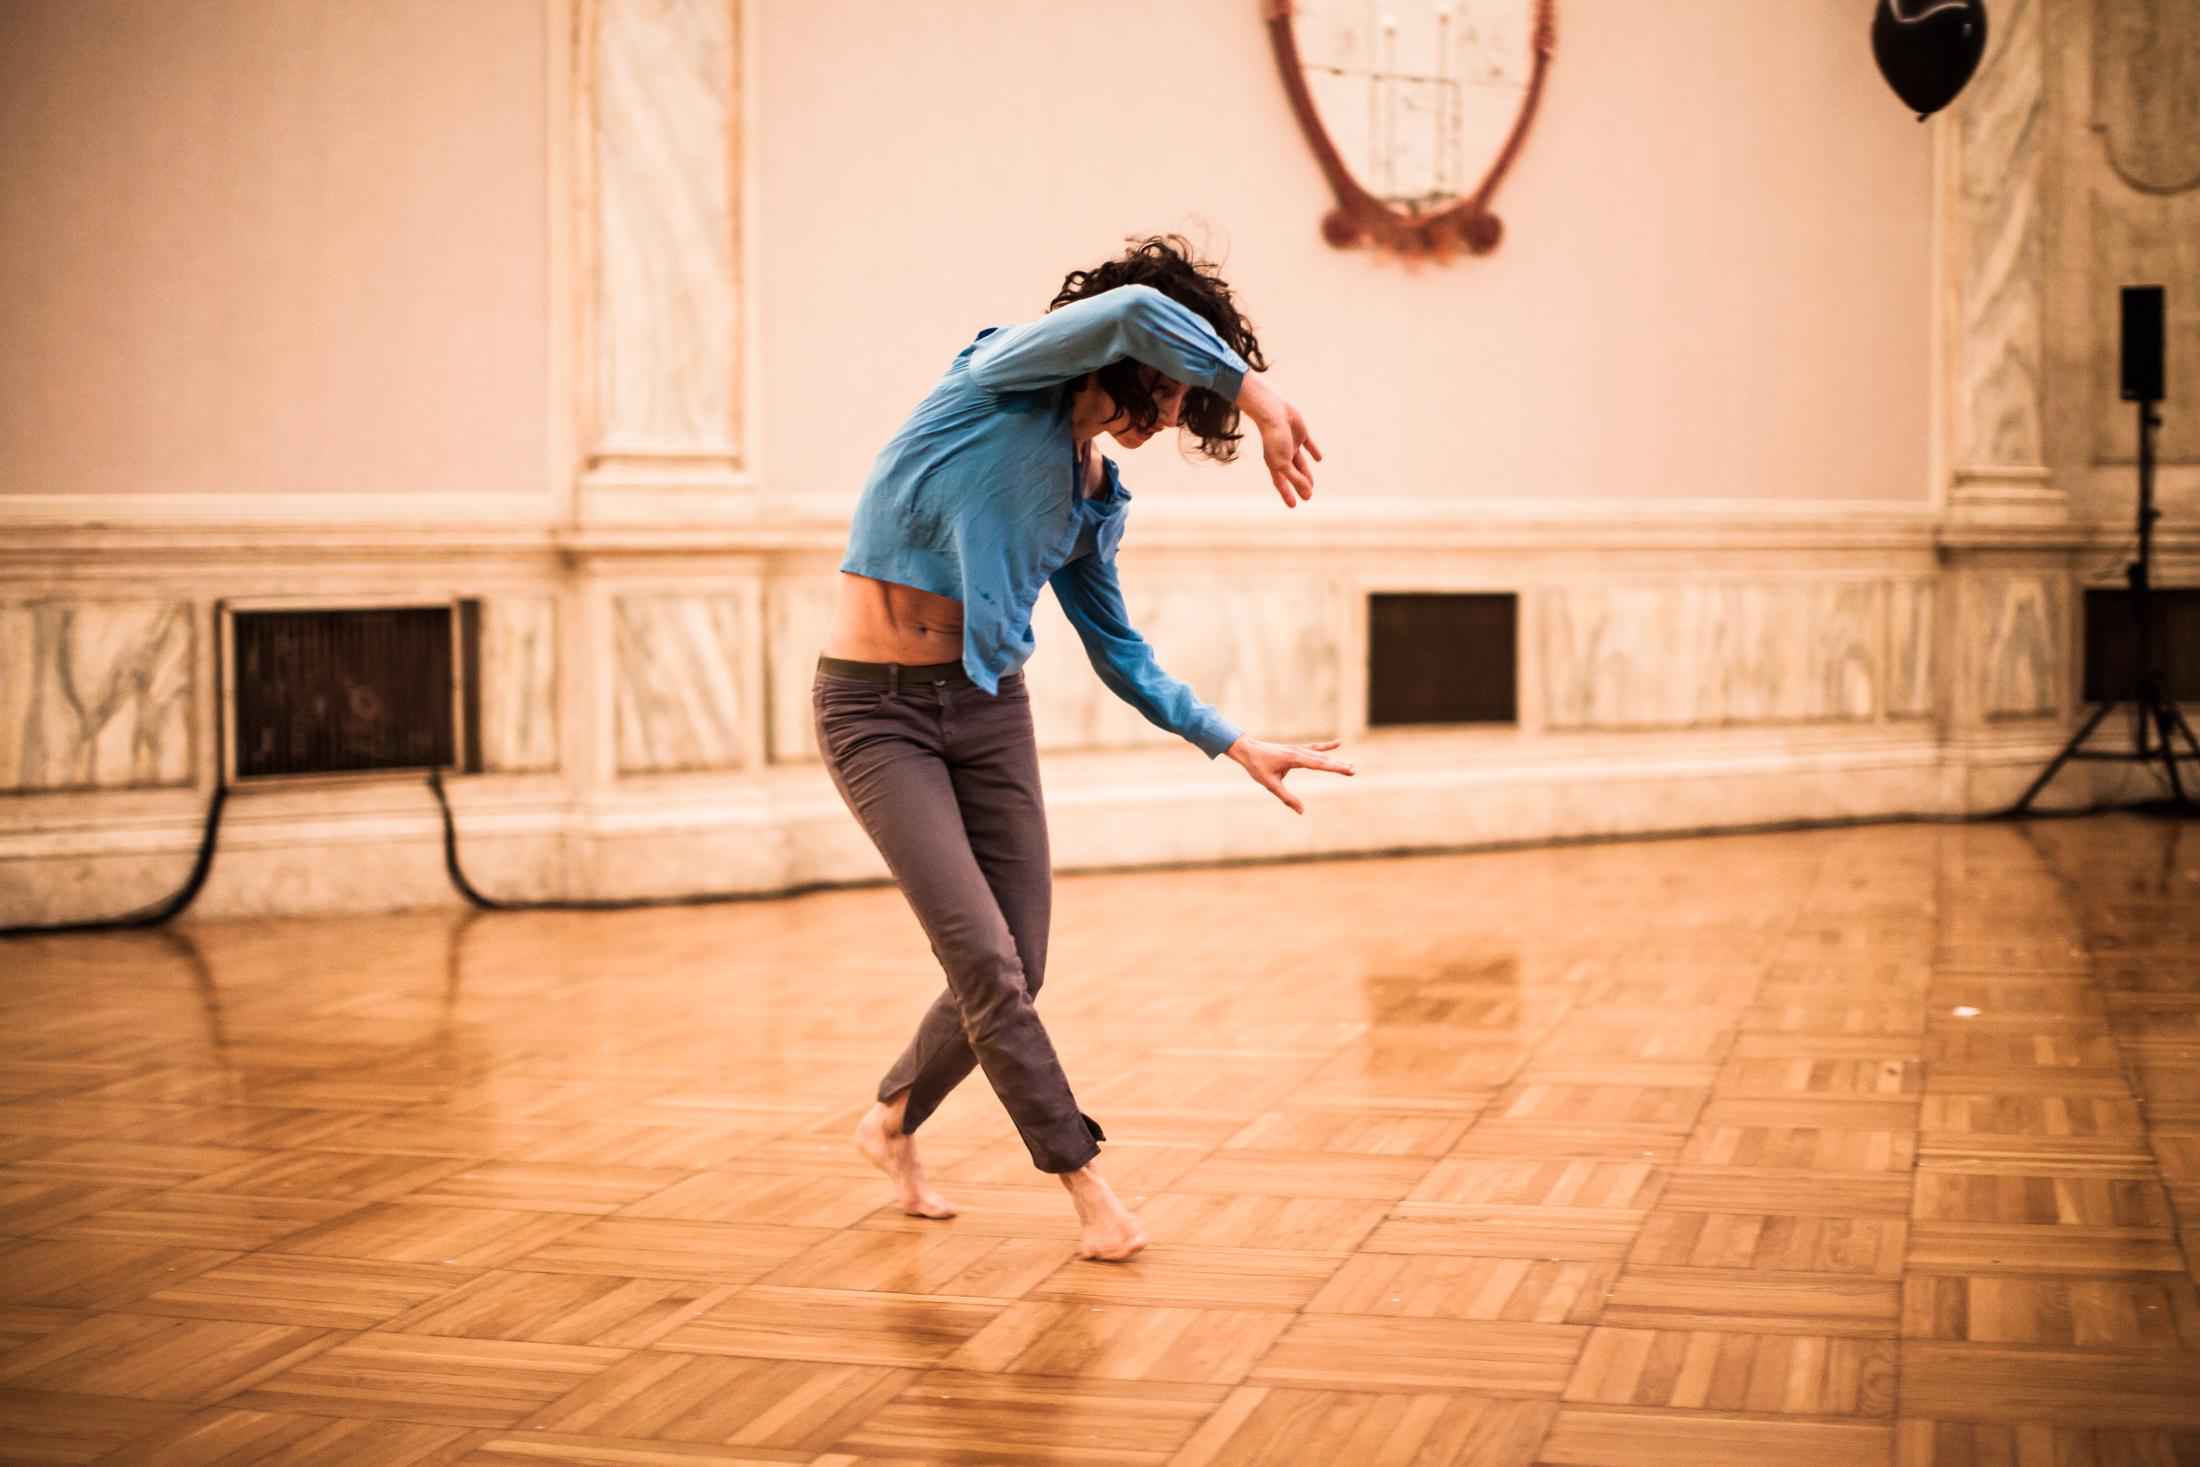 https://www.danzaurbana.eu/associazione/wp-content/uploads/2018/05/Masdanza_C_Basso_2017.jpg